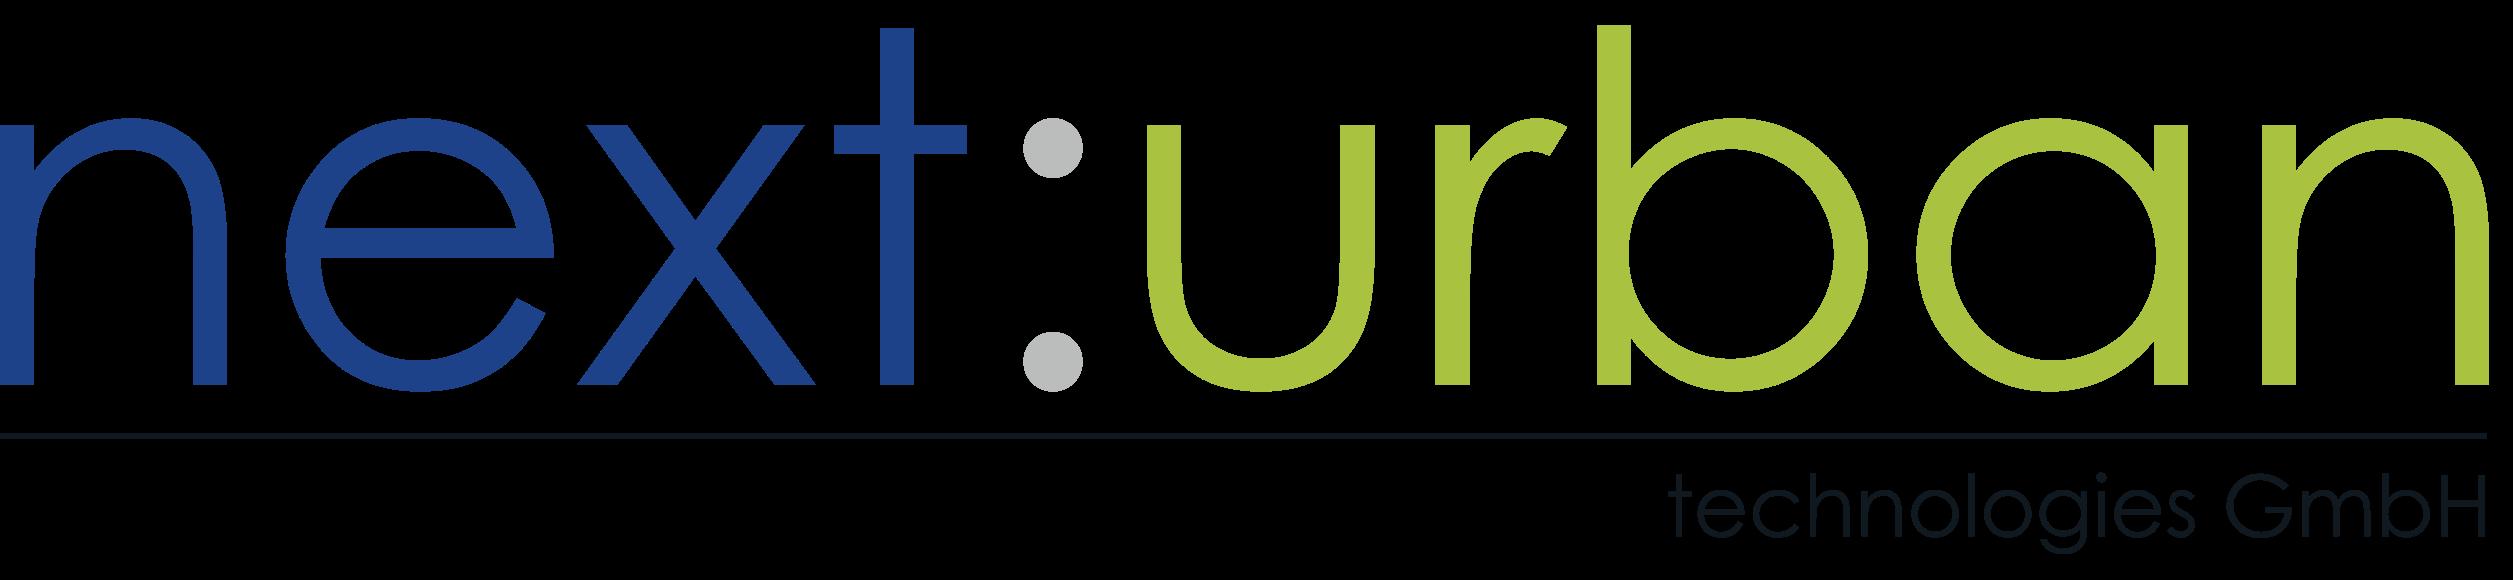 next:urban technologies GmbH